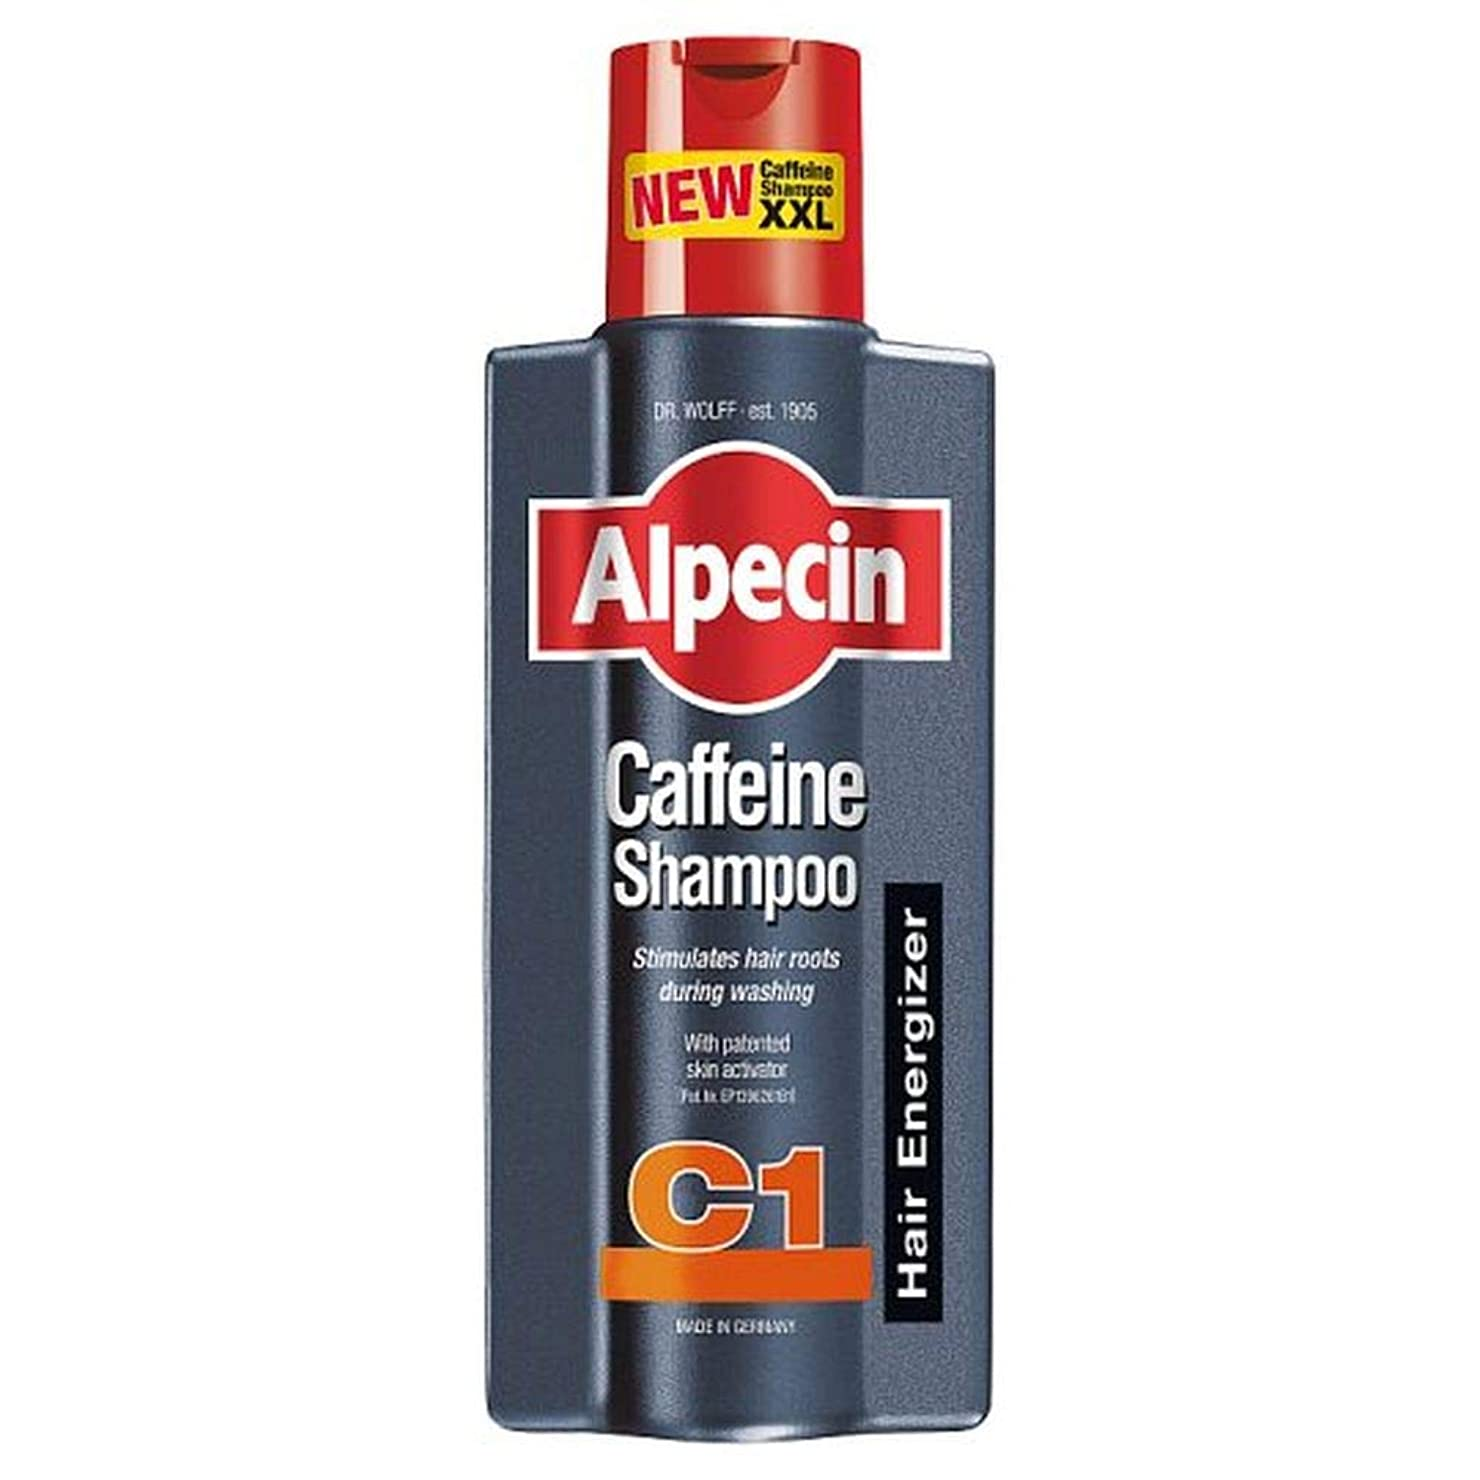 [Alpecin] C1シャンプー375ミリリットルAlpecin - Alpecin C1 Shampoo 375Ml [並行輸入品]